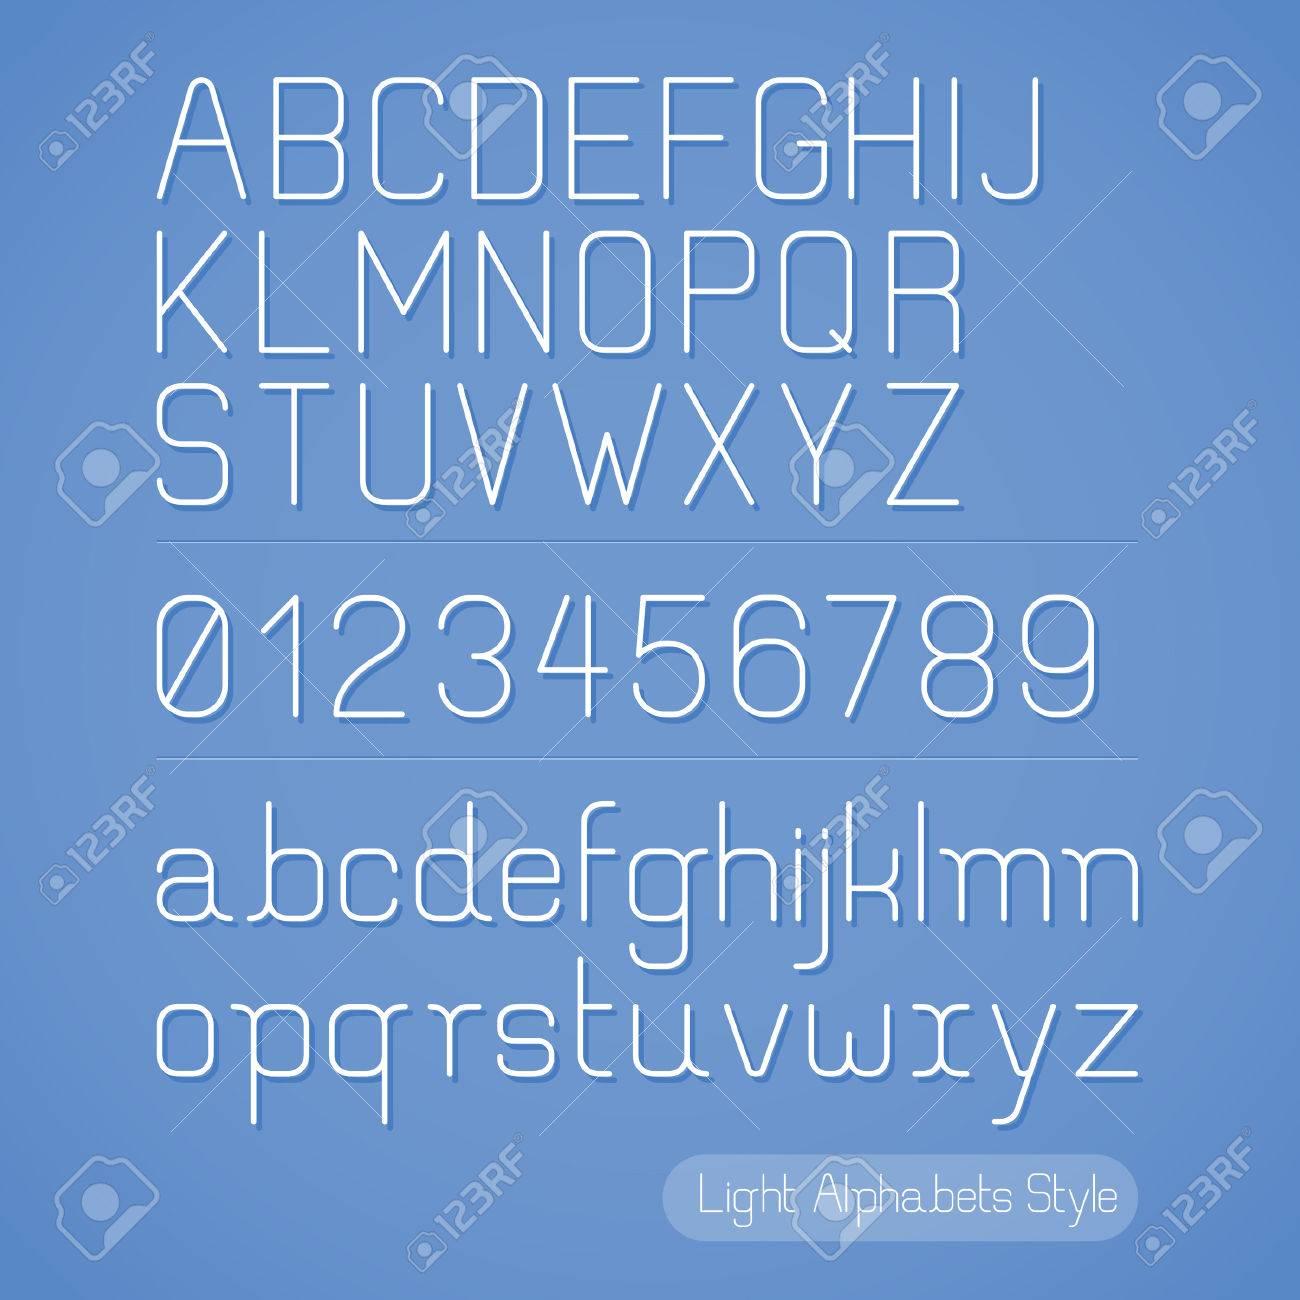 Alphabet Line style. Vector illustration. Stock Vector - 22958014